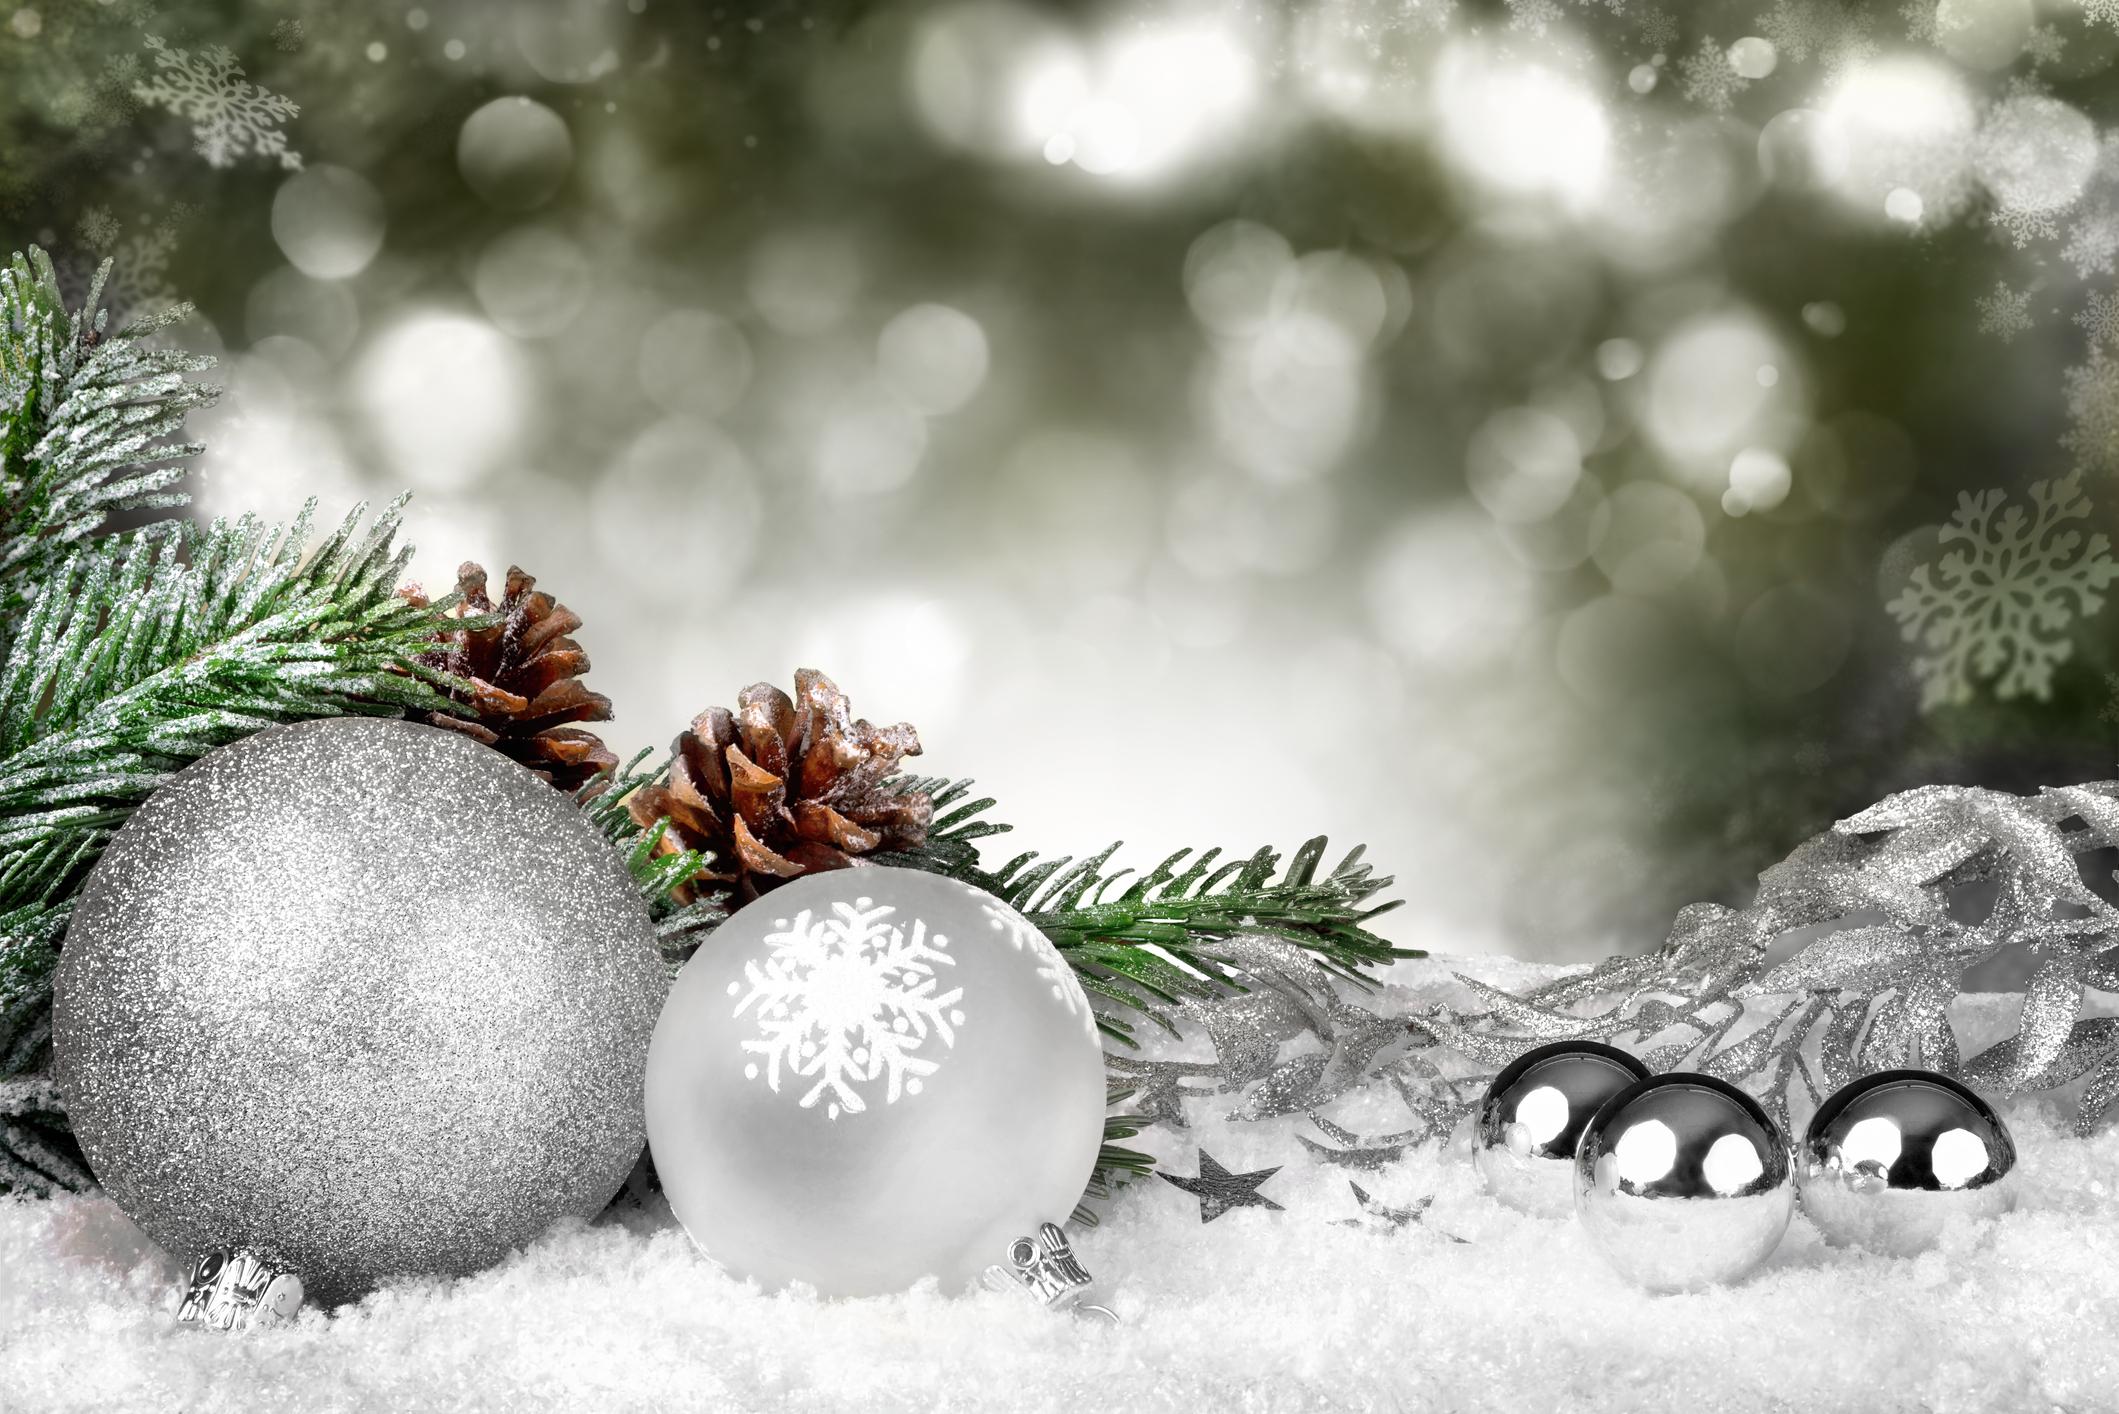 Wintery Christmas Ornaments